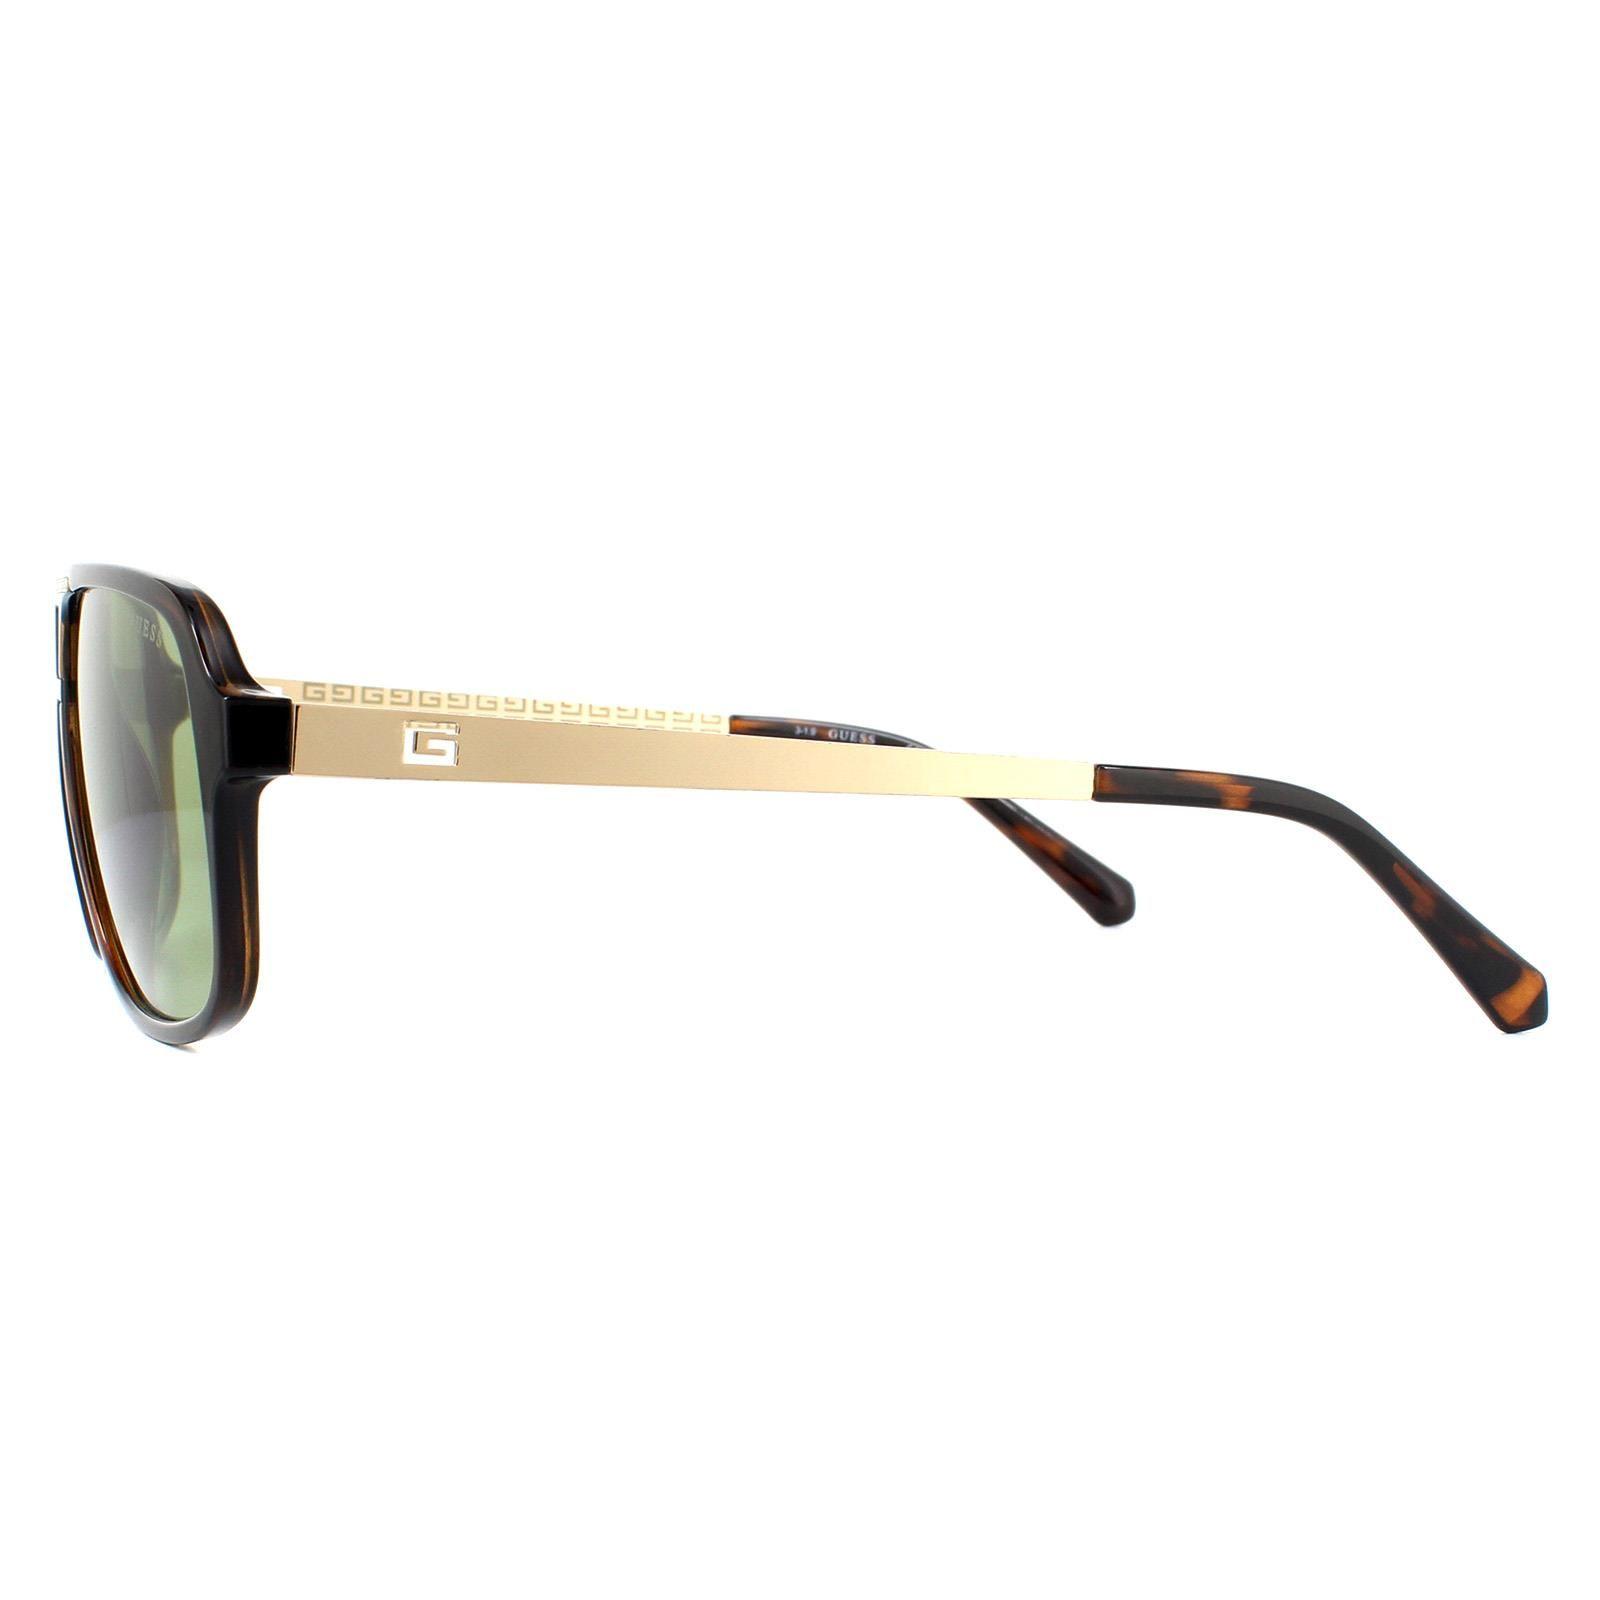 Guess Sunglasses GU6955 52N Dark Havana Green